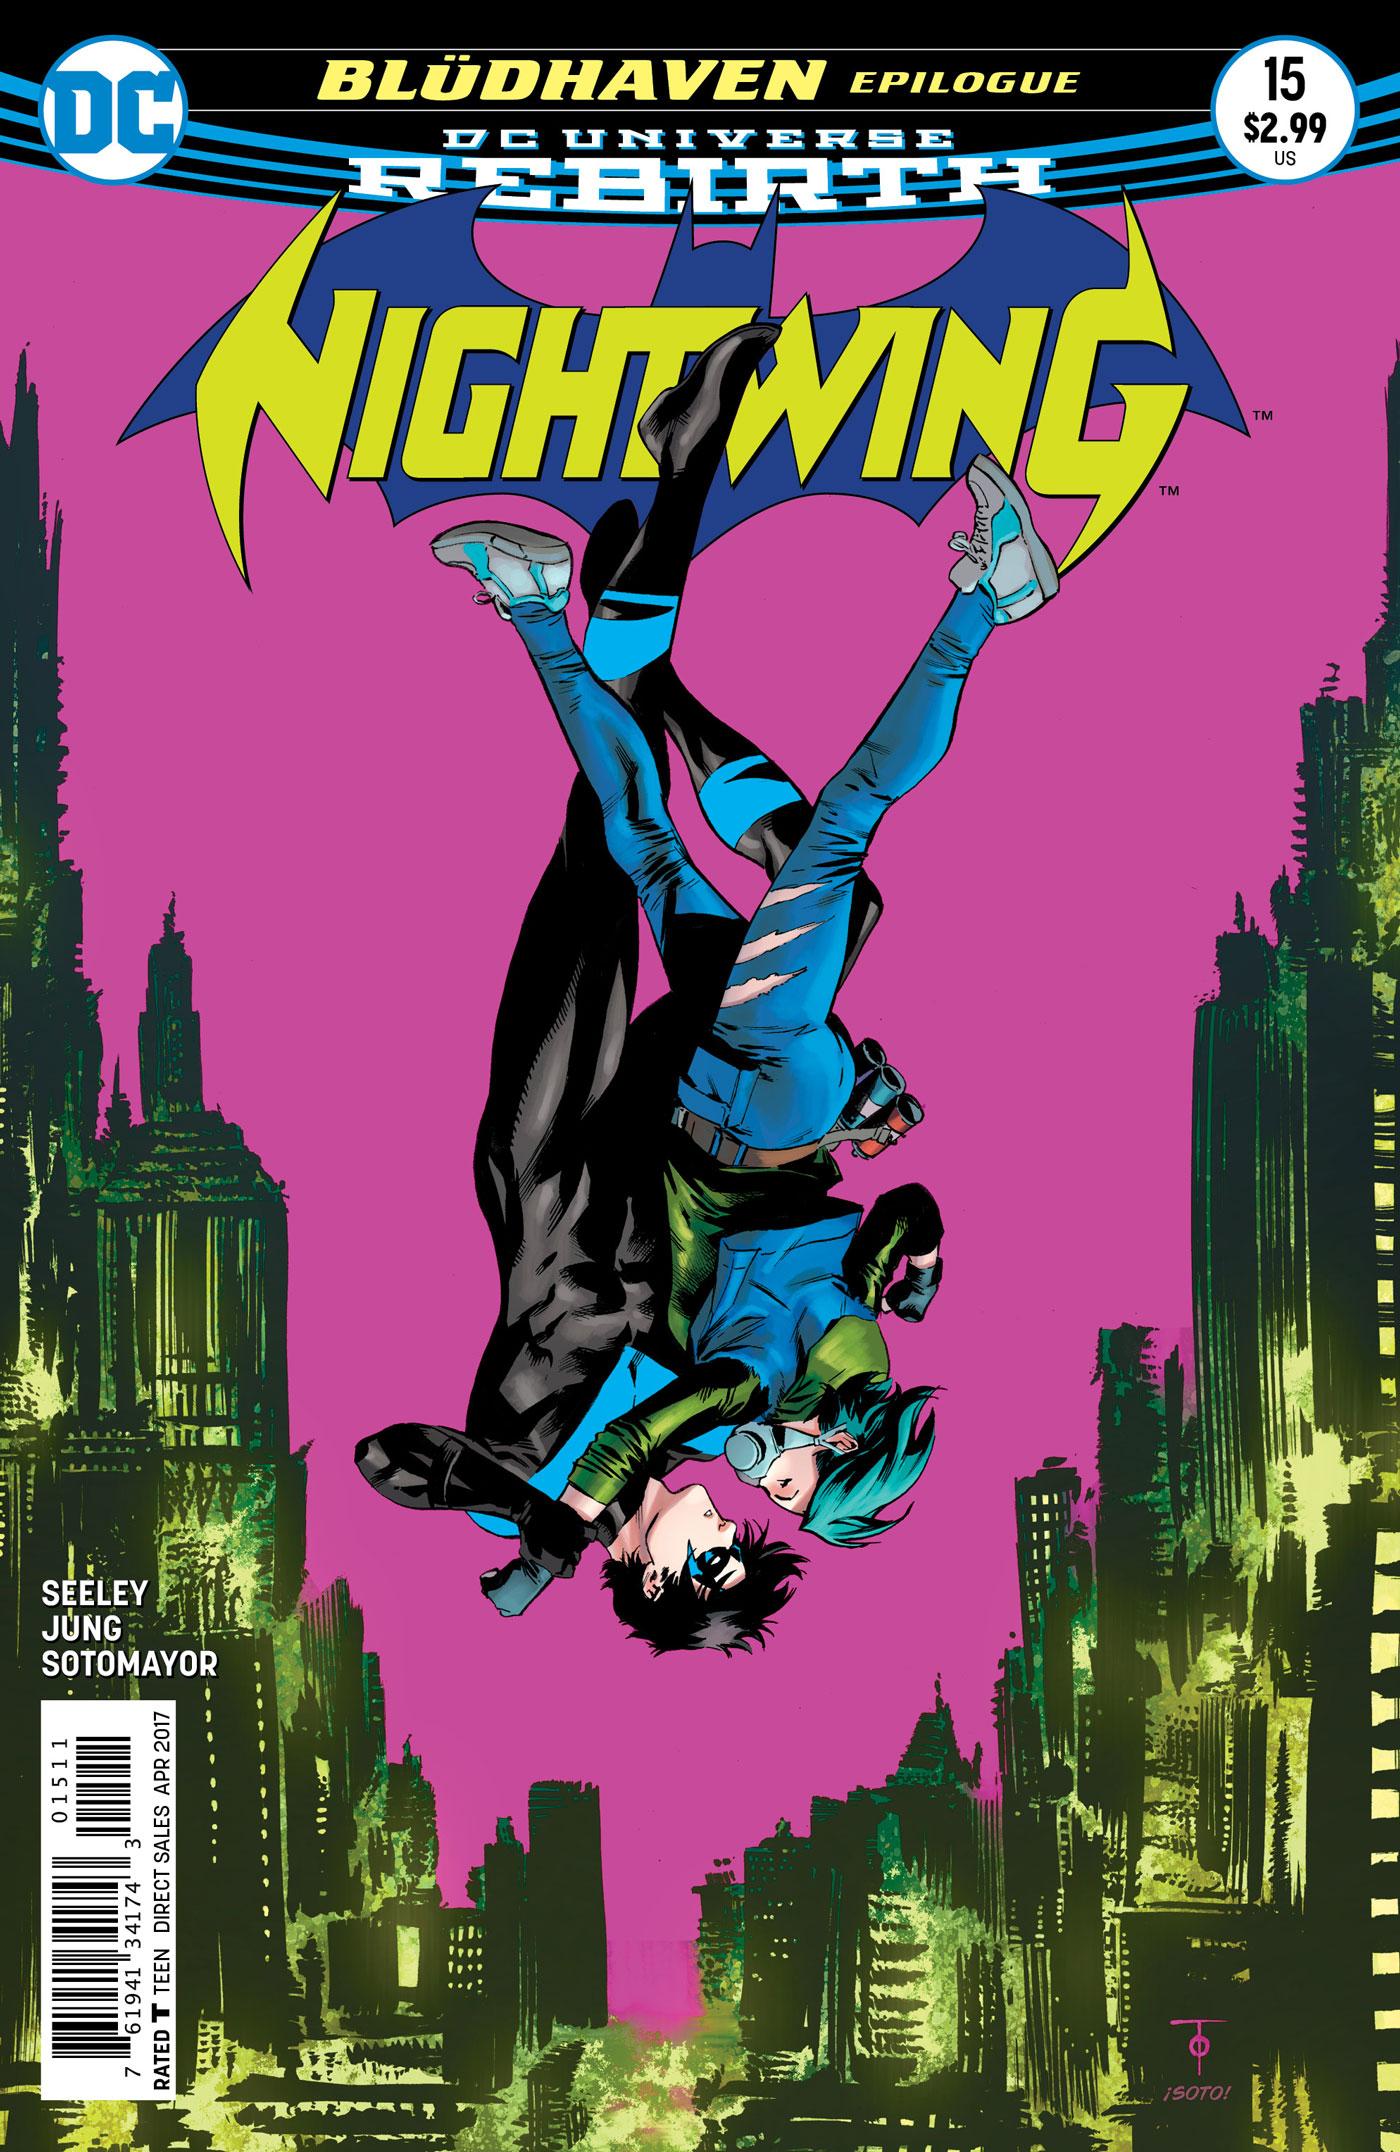 Marvel Power Girl Wallpaper Dec160305 Nightwing 15 Previews World